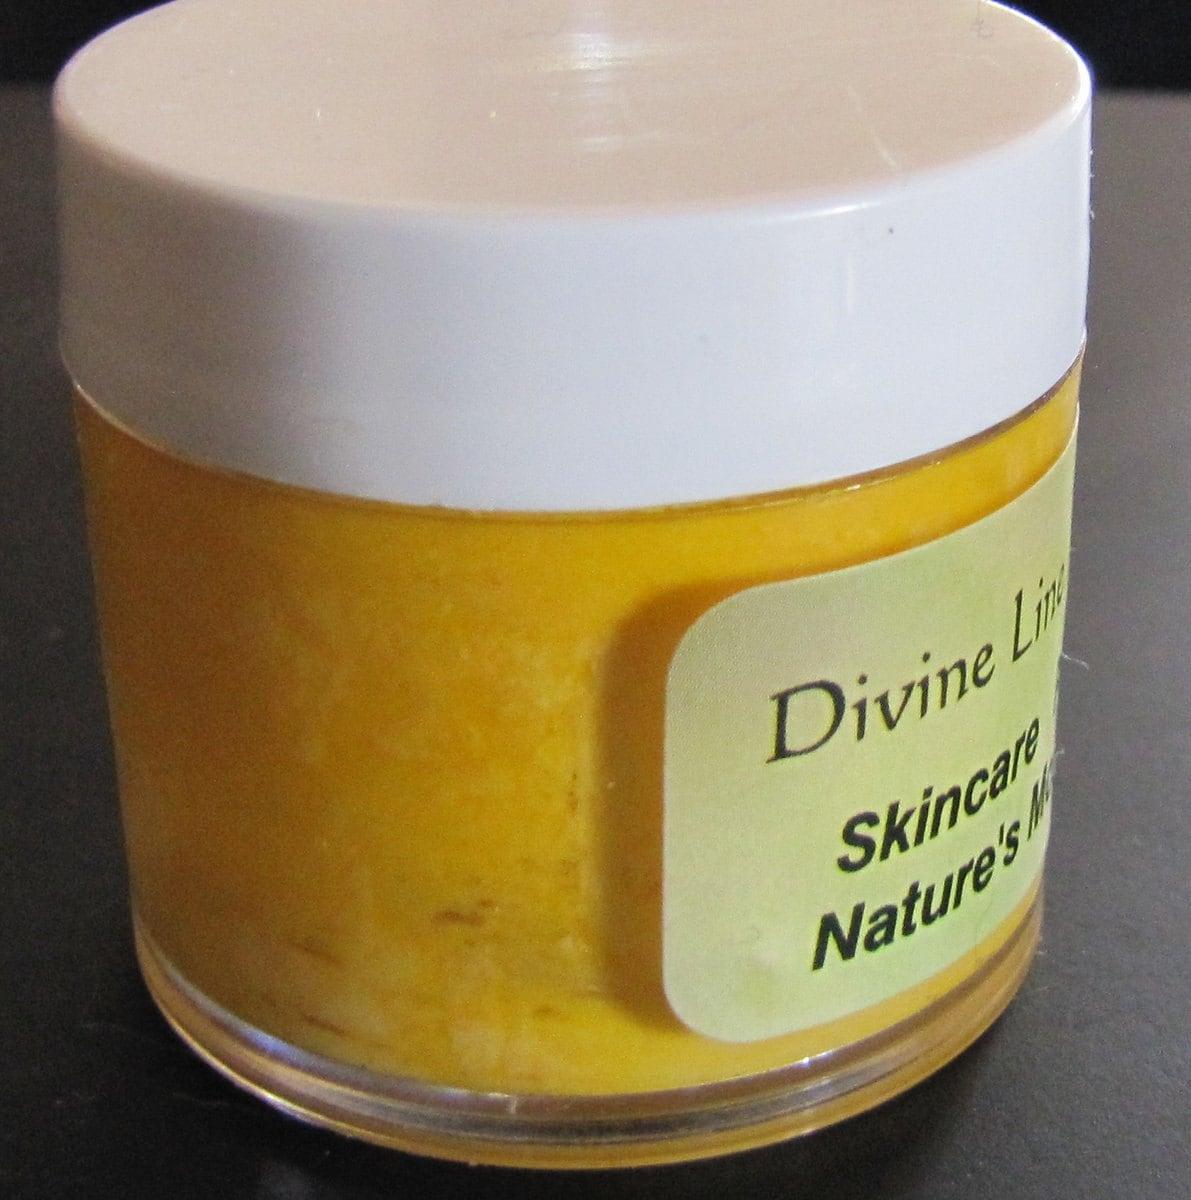 EaseUp PSORIASIS AND ECZEMA Moisturizing Butter Balm